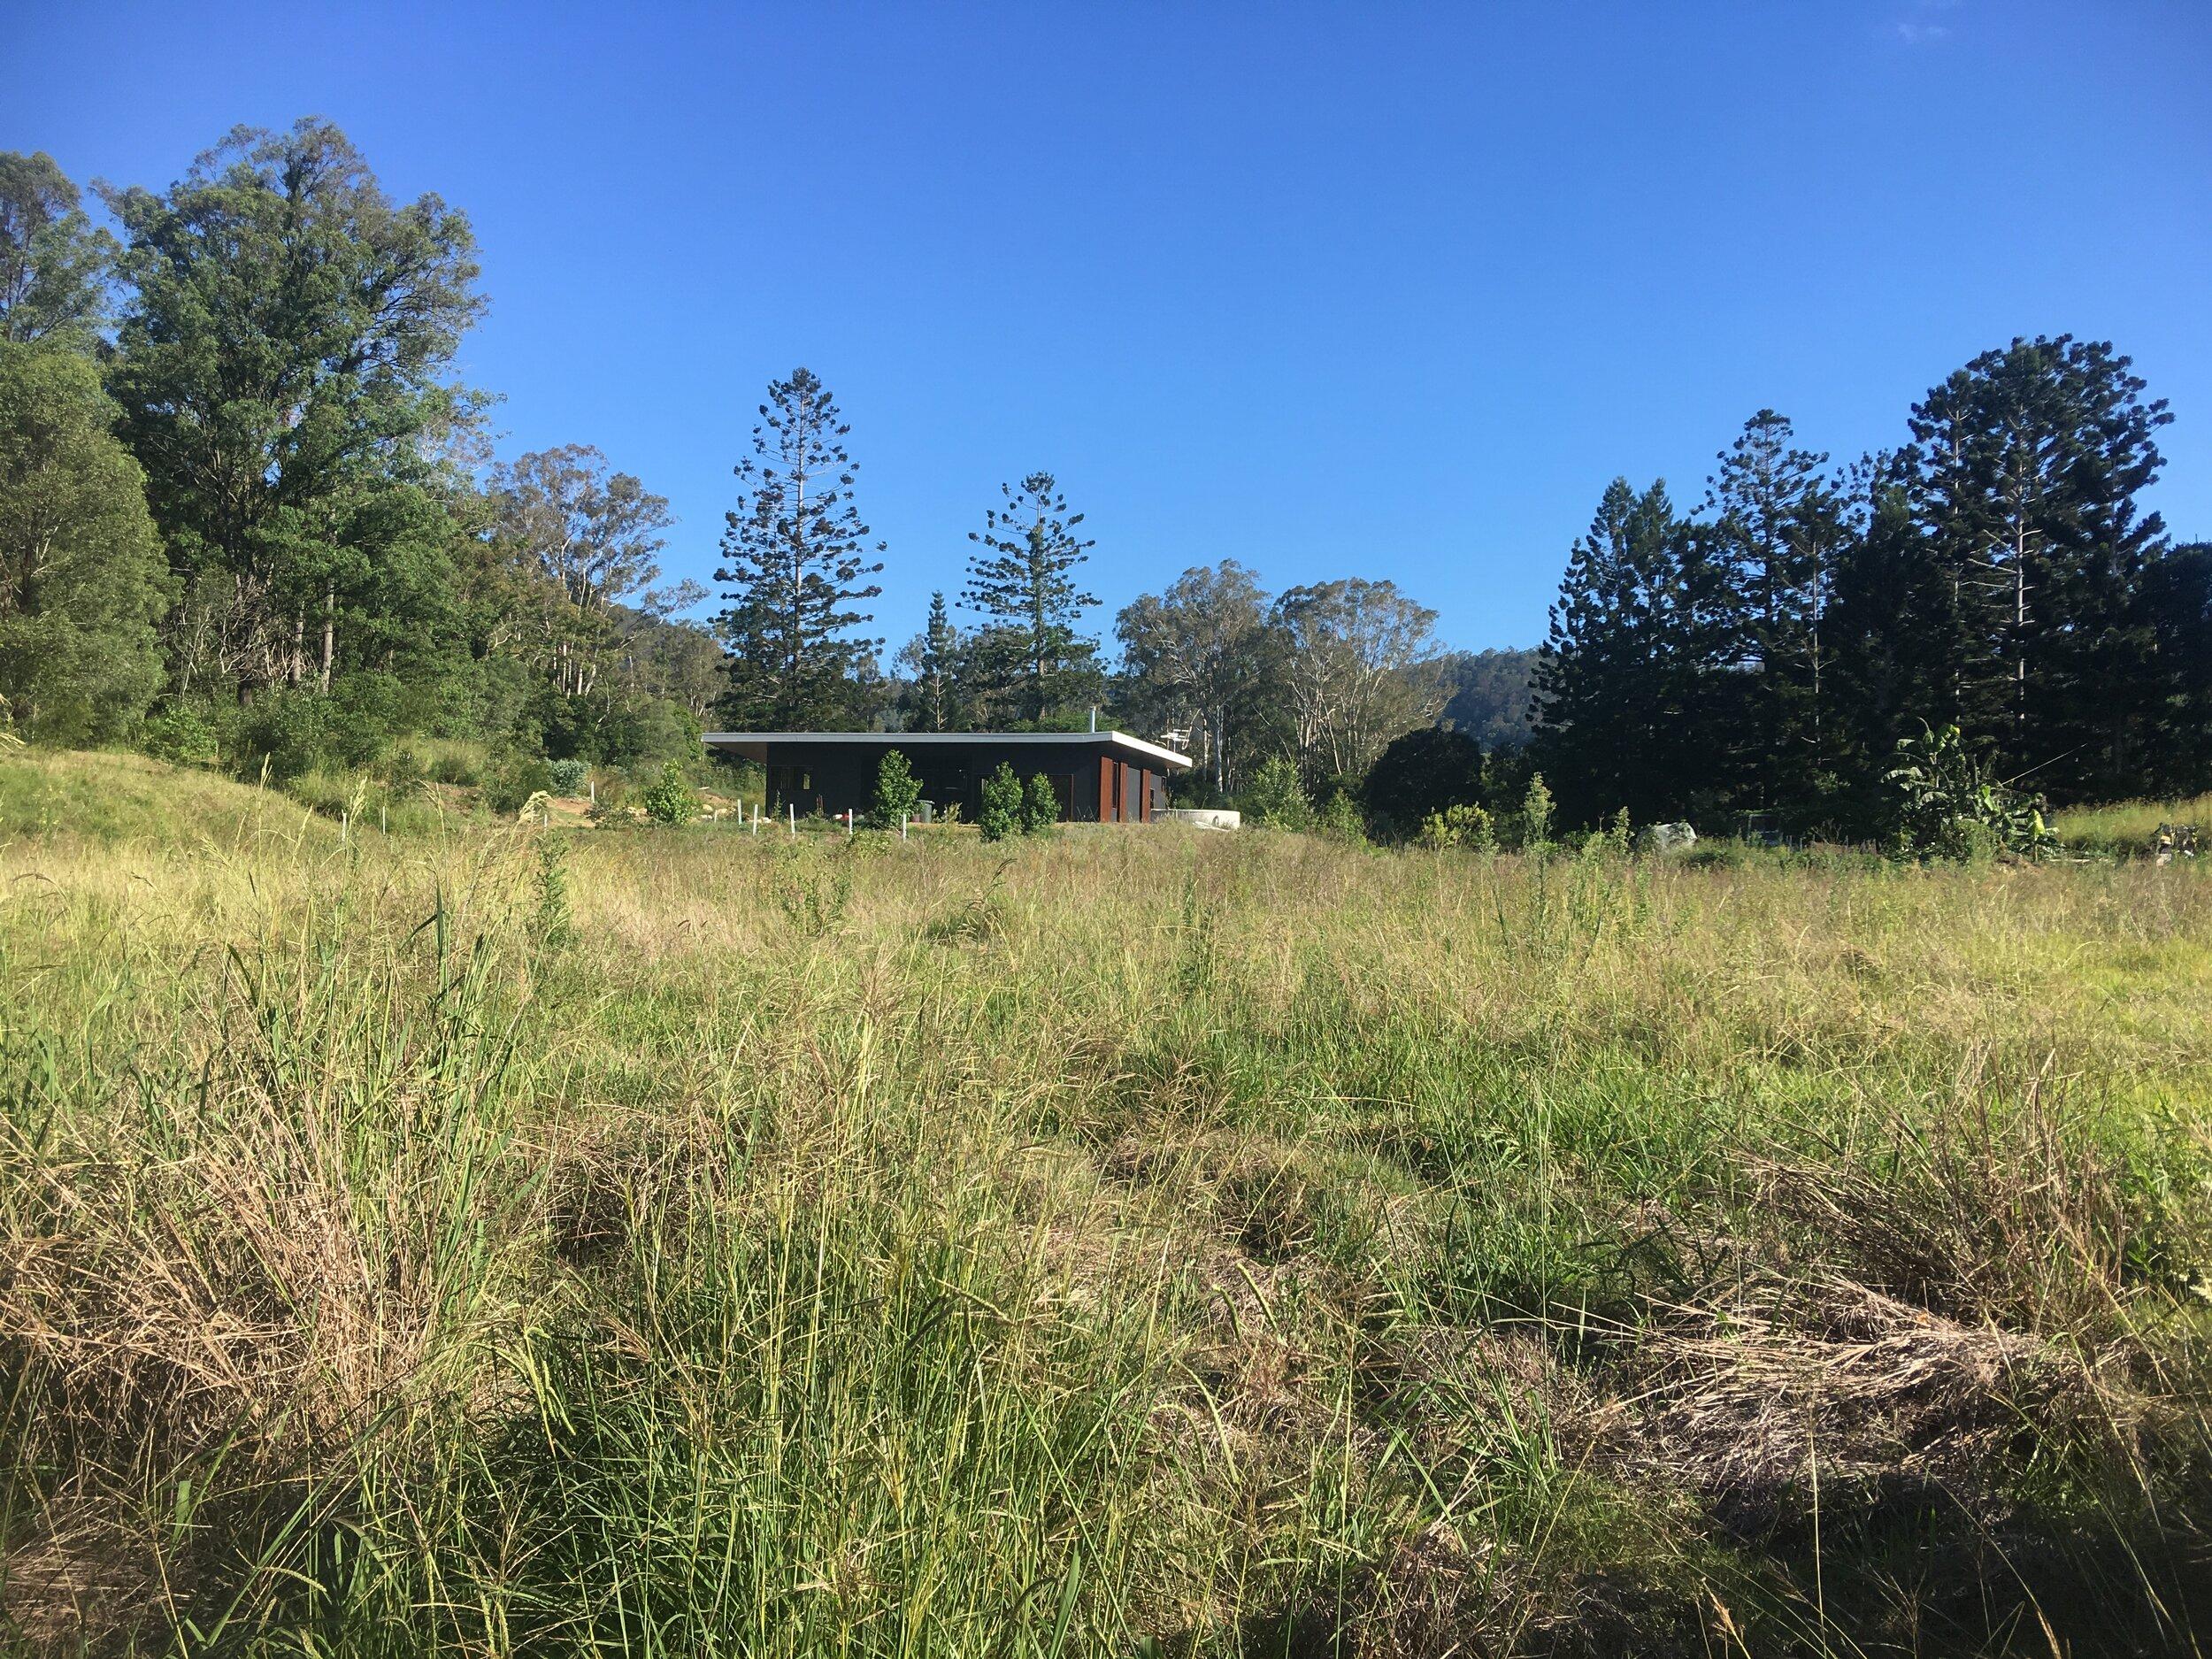 20171218 camp mountain house 4.JPG